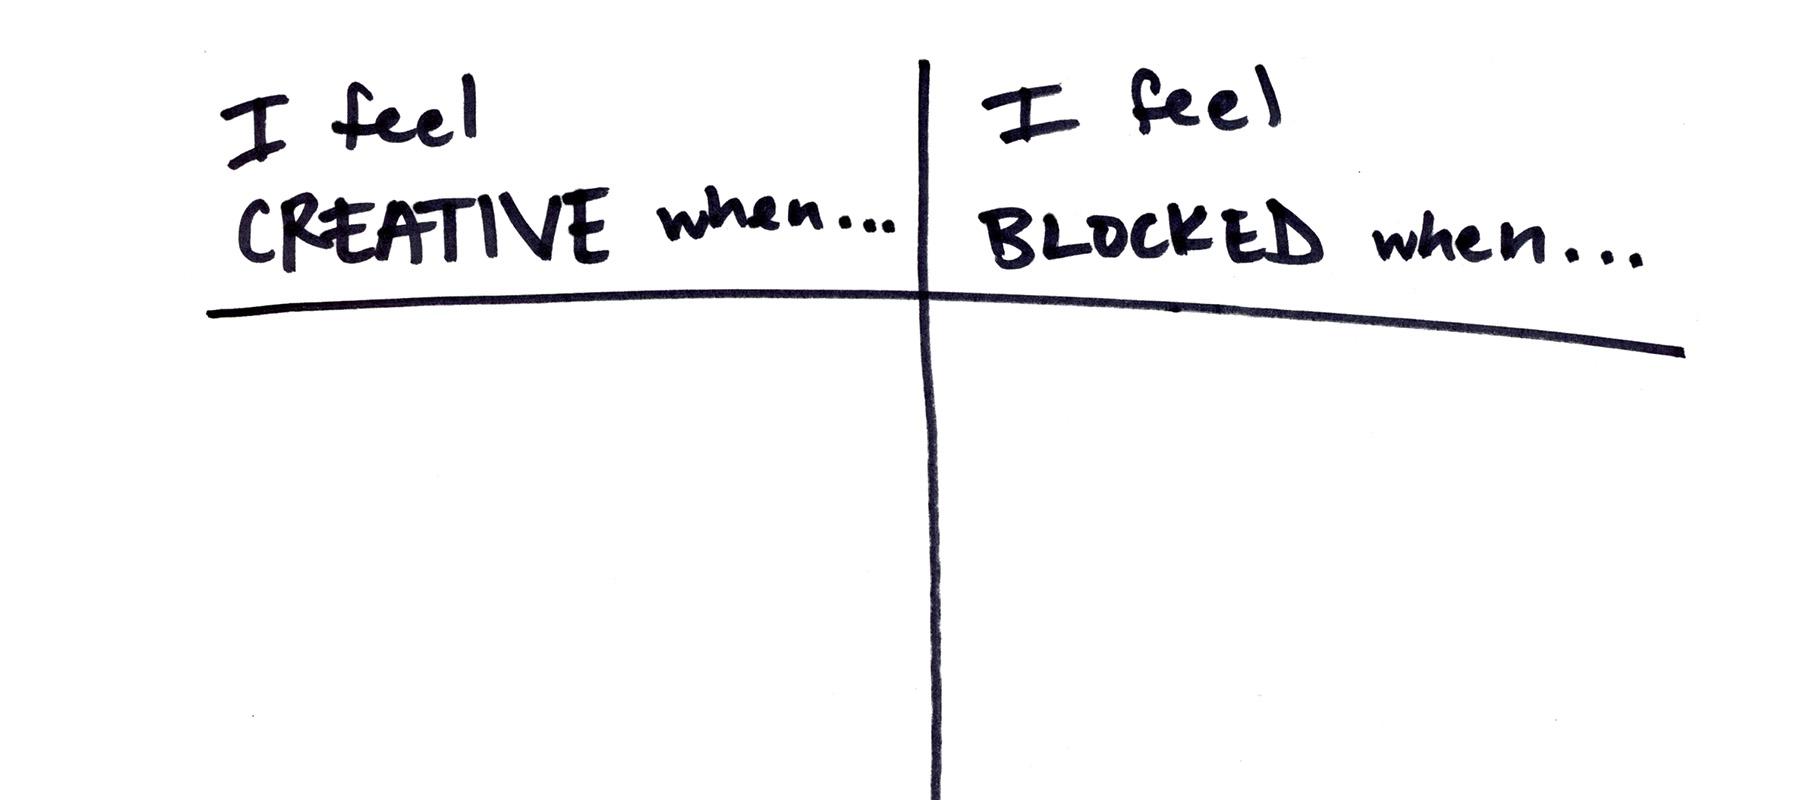 Creative vs Blocked Anna Brones